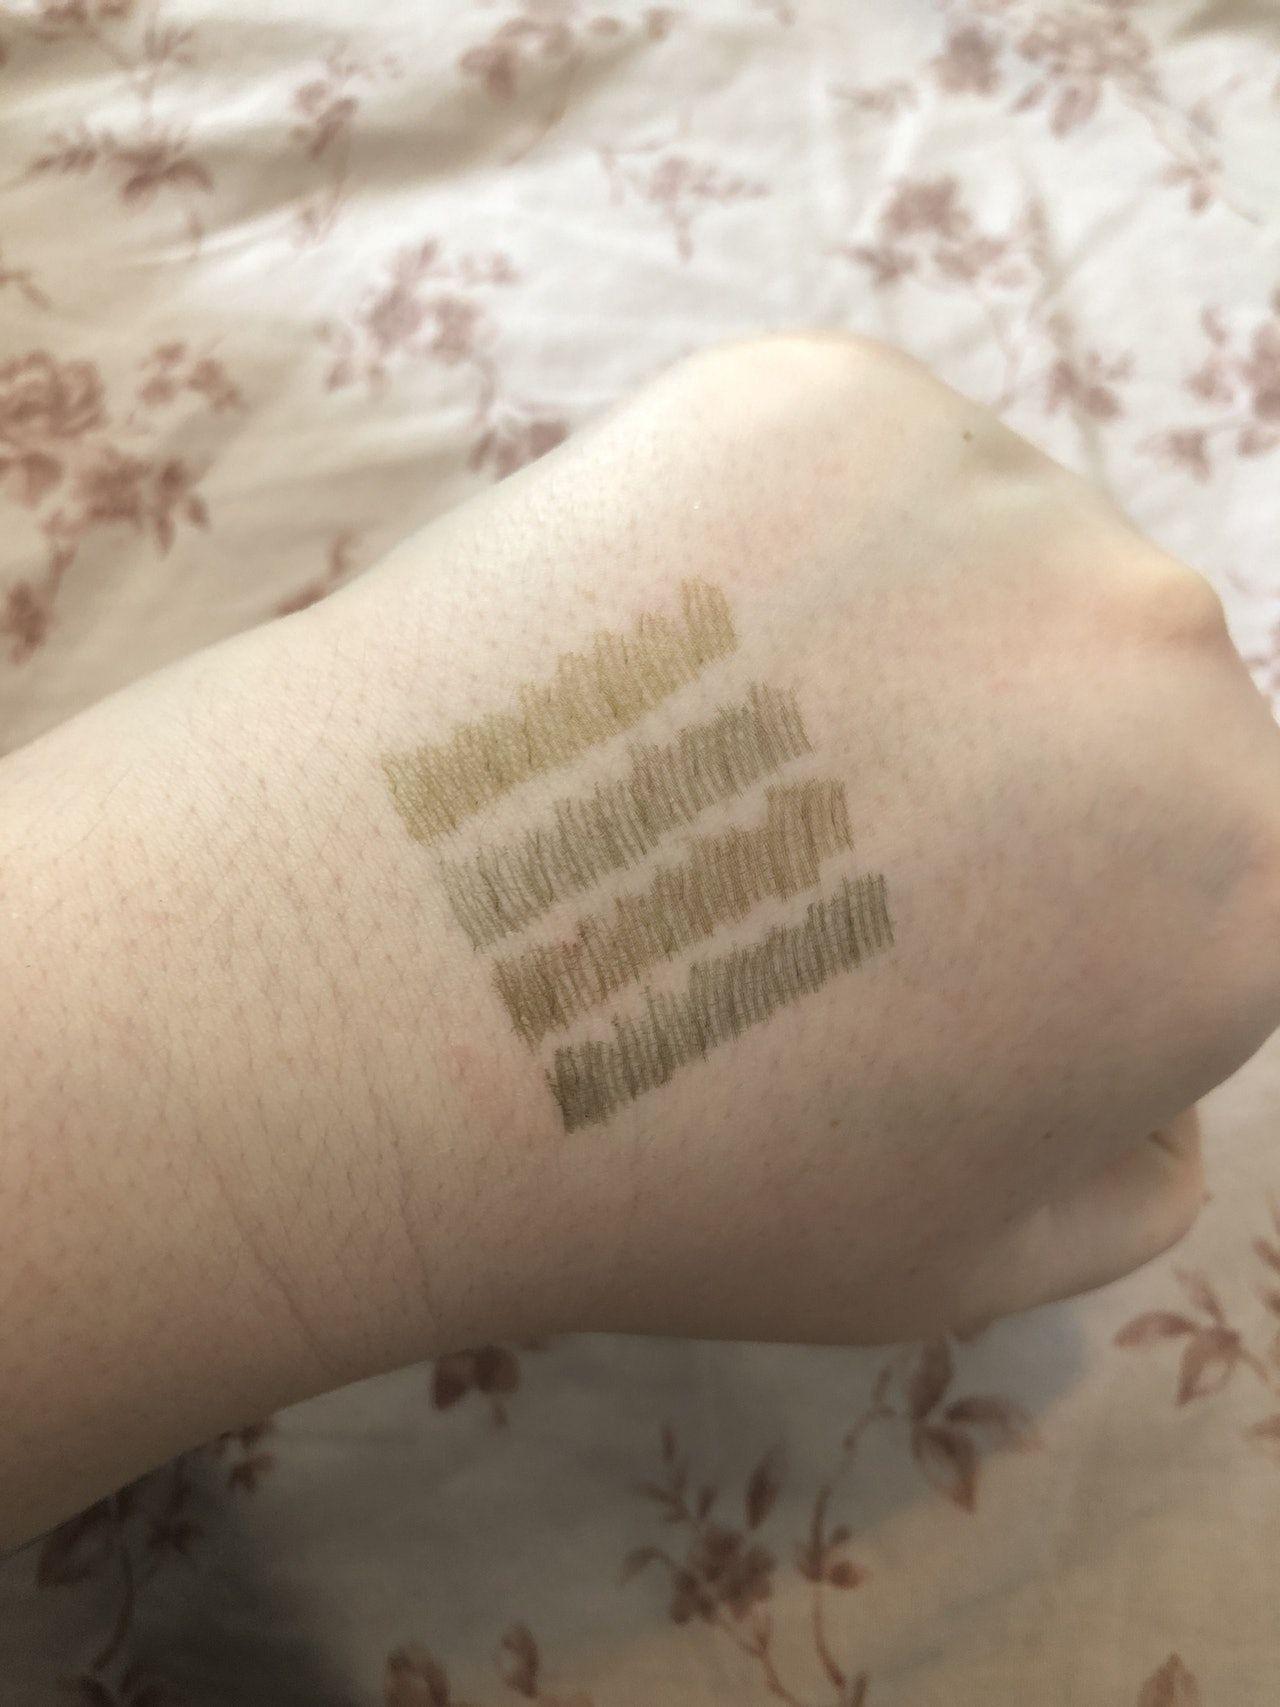 1ffd2635626 This Maybelline Tattoo Studio Brow Tint Pen Review Has Me Kissing  Microblading Goodbye #EyebagsUnderEyes